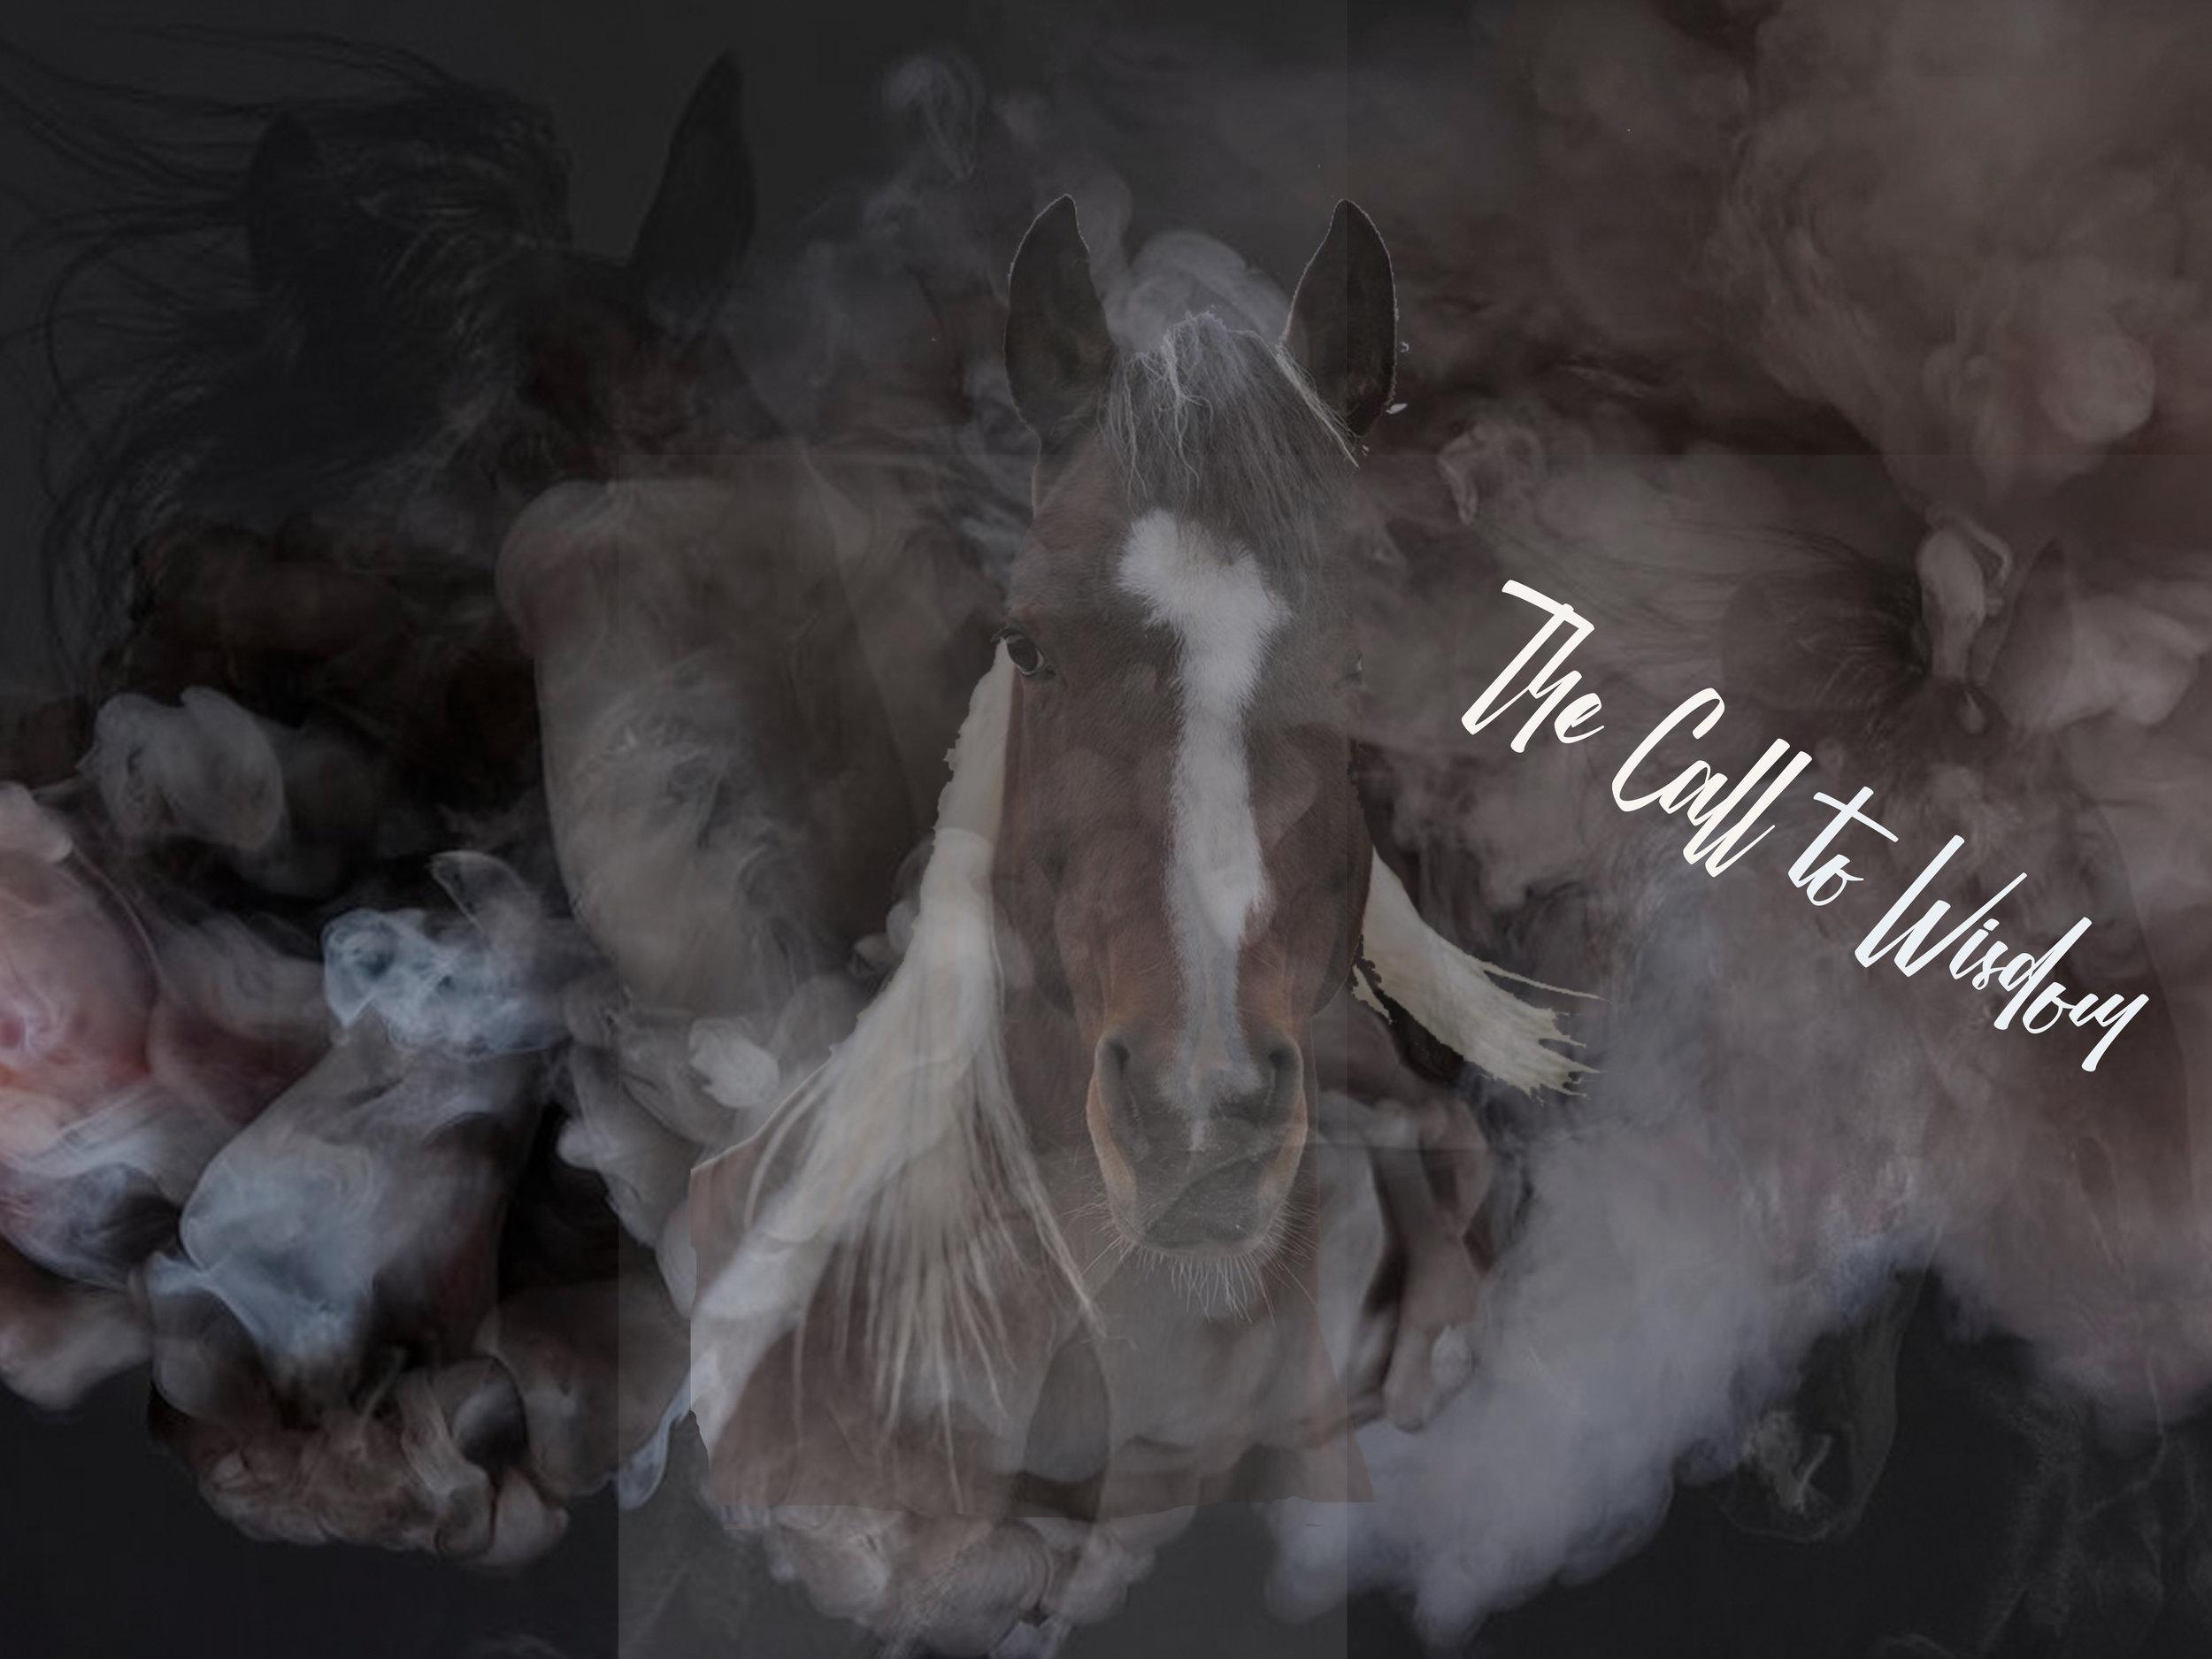 Smoky the Horse